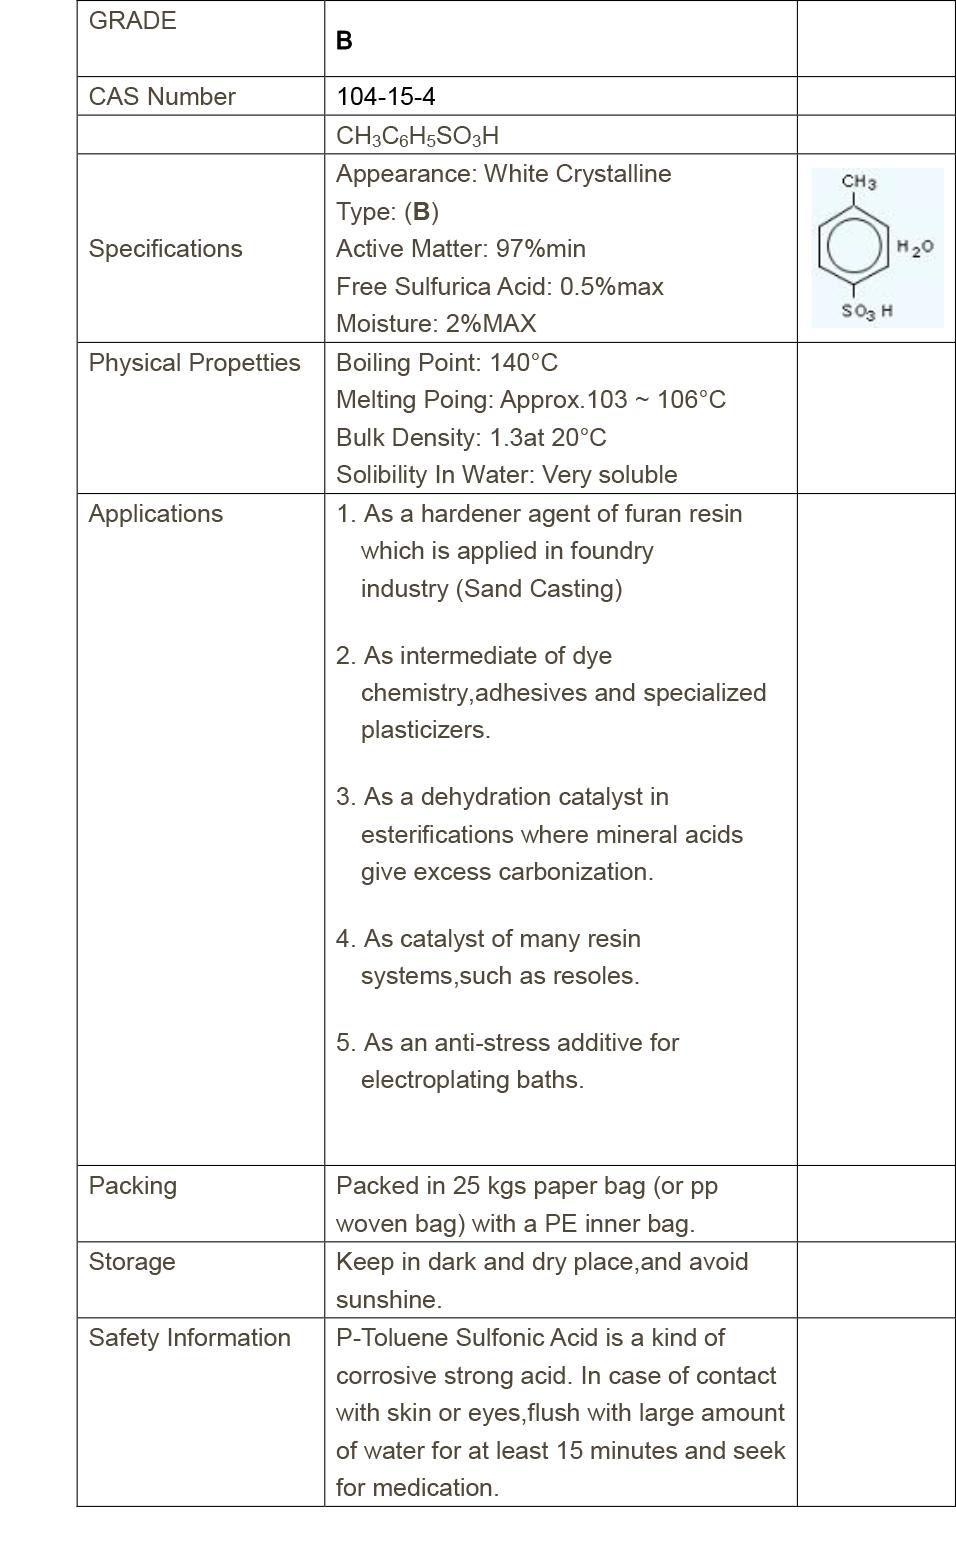 PTSA Grade-B(97%)/p-Toluenesulfonic acid